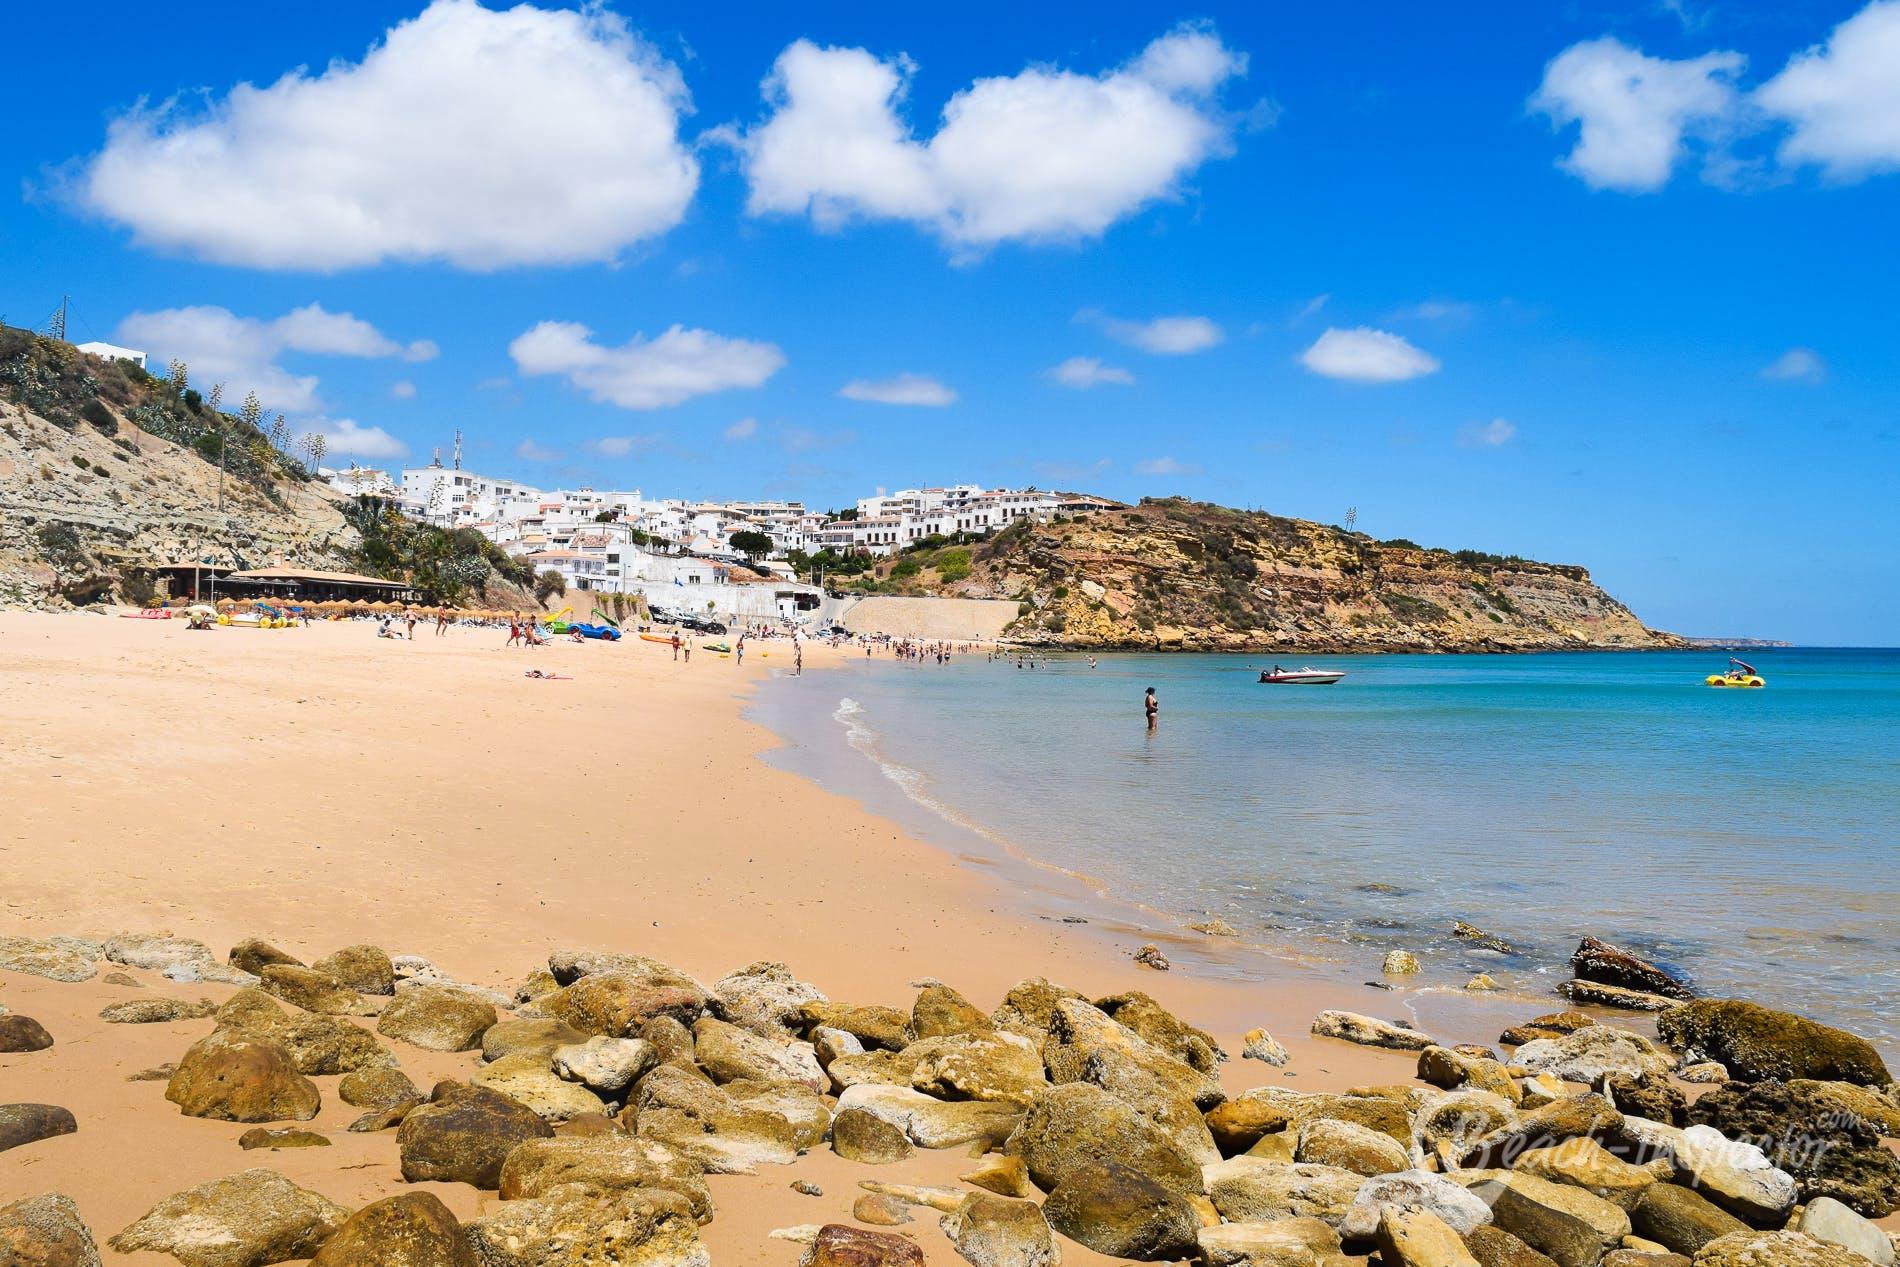 Playa Praia do Burgau, Algarve, Portugal